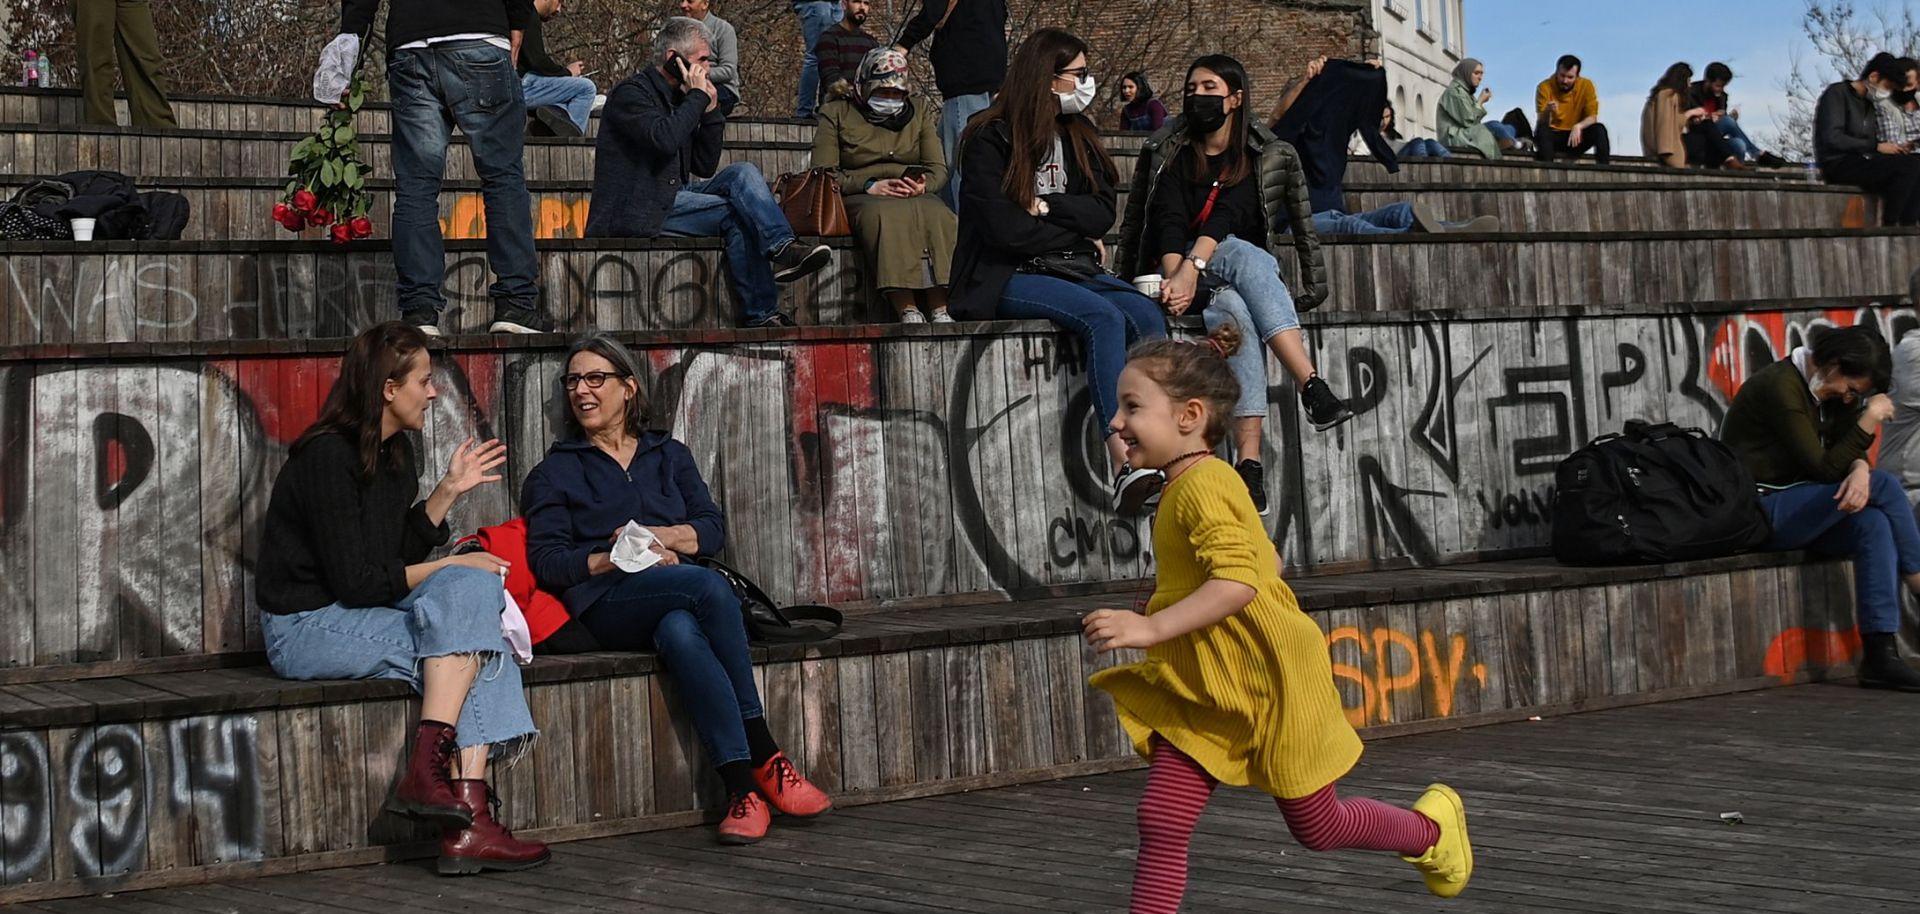 A child runs past people sitting near the Galata Bridge in Istanbul, Turkey, on Feb. 8, 2021.